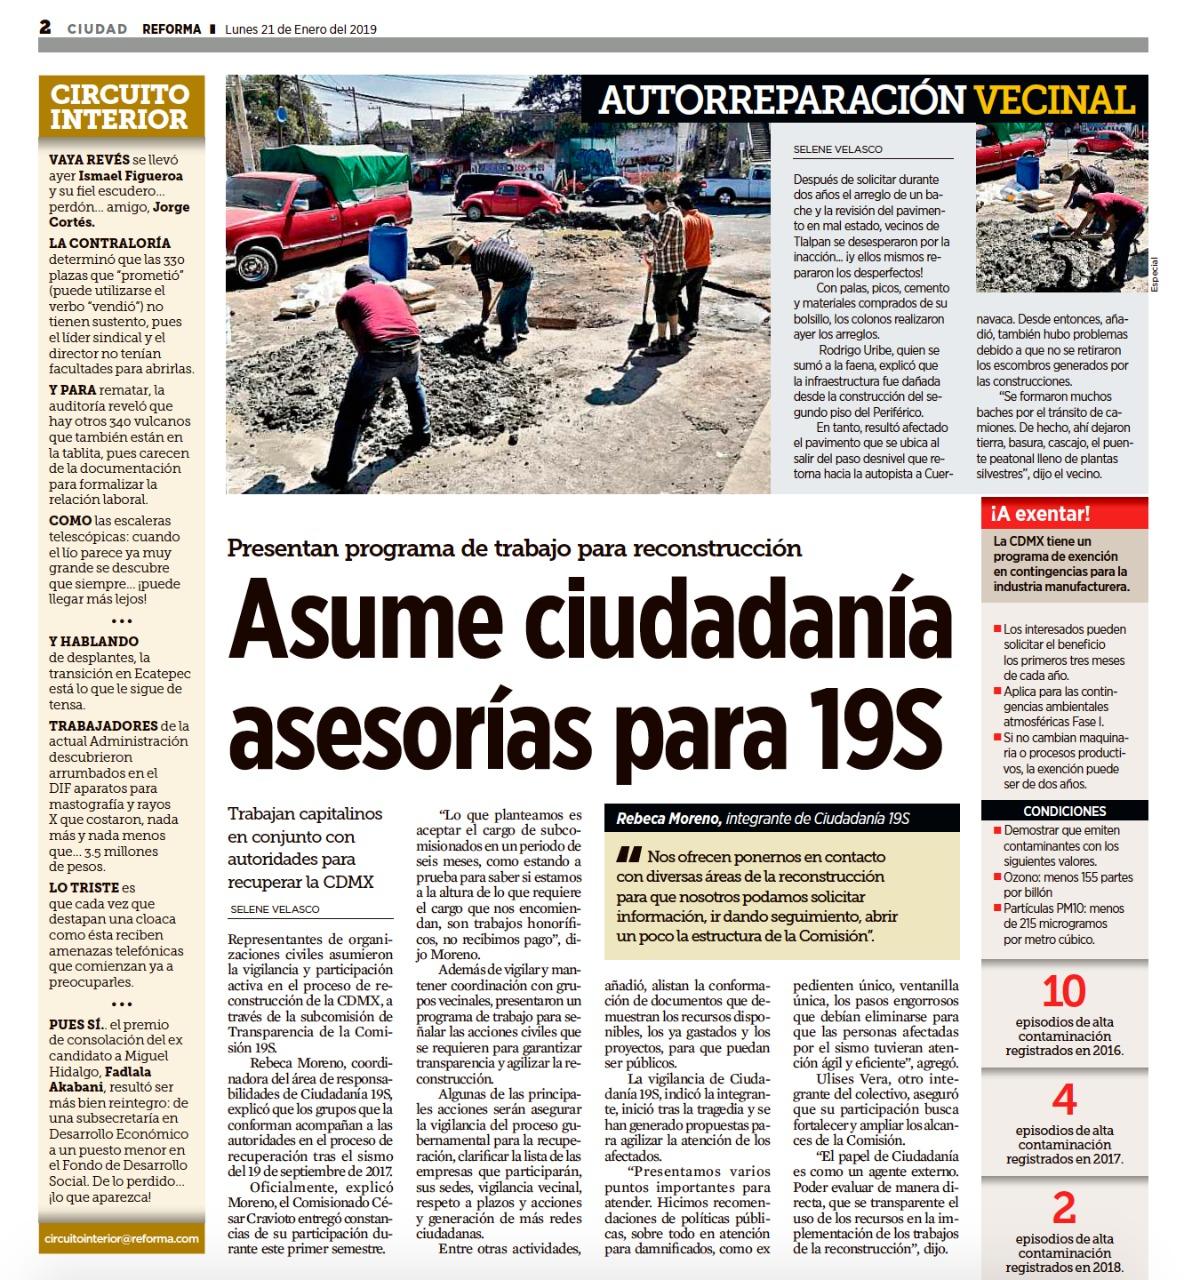 Ciudadania19s (5)